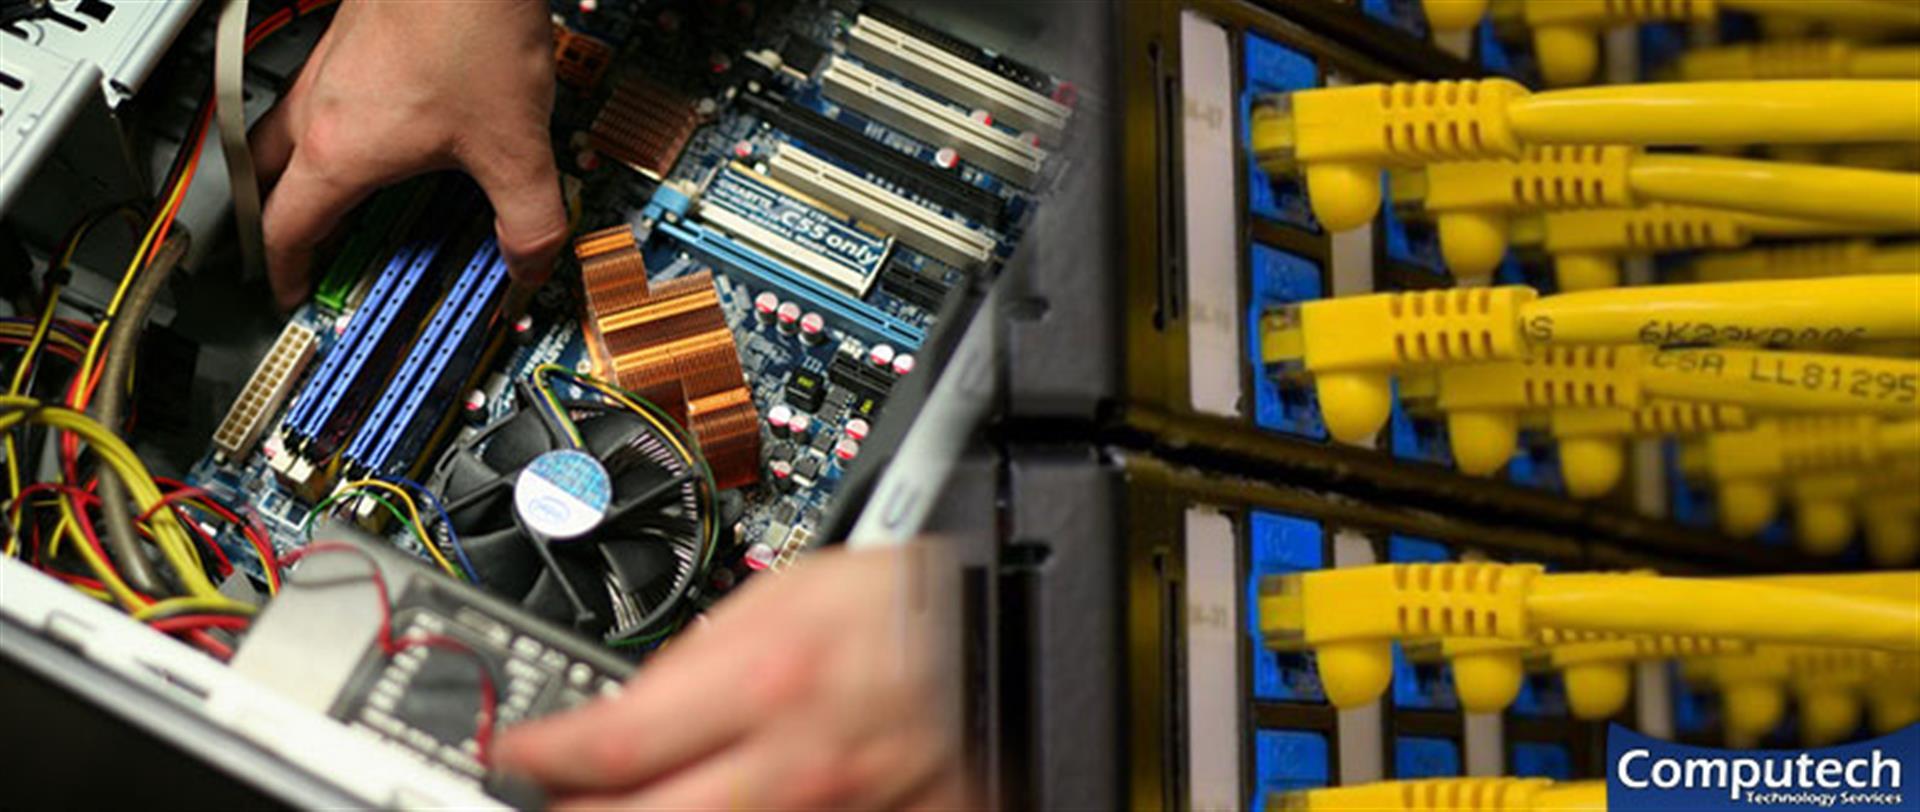 Narrows Virginia Onsite Computer & Printer Repair, Networking, Voice & Data Cabling Contractors